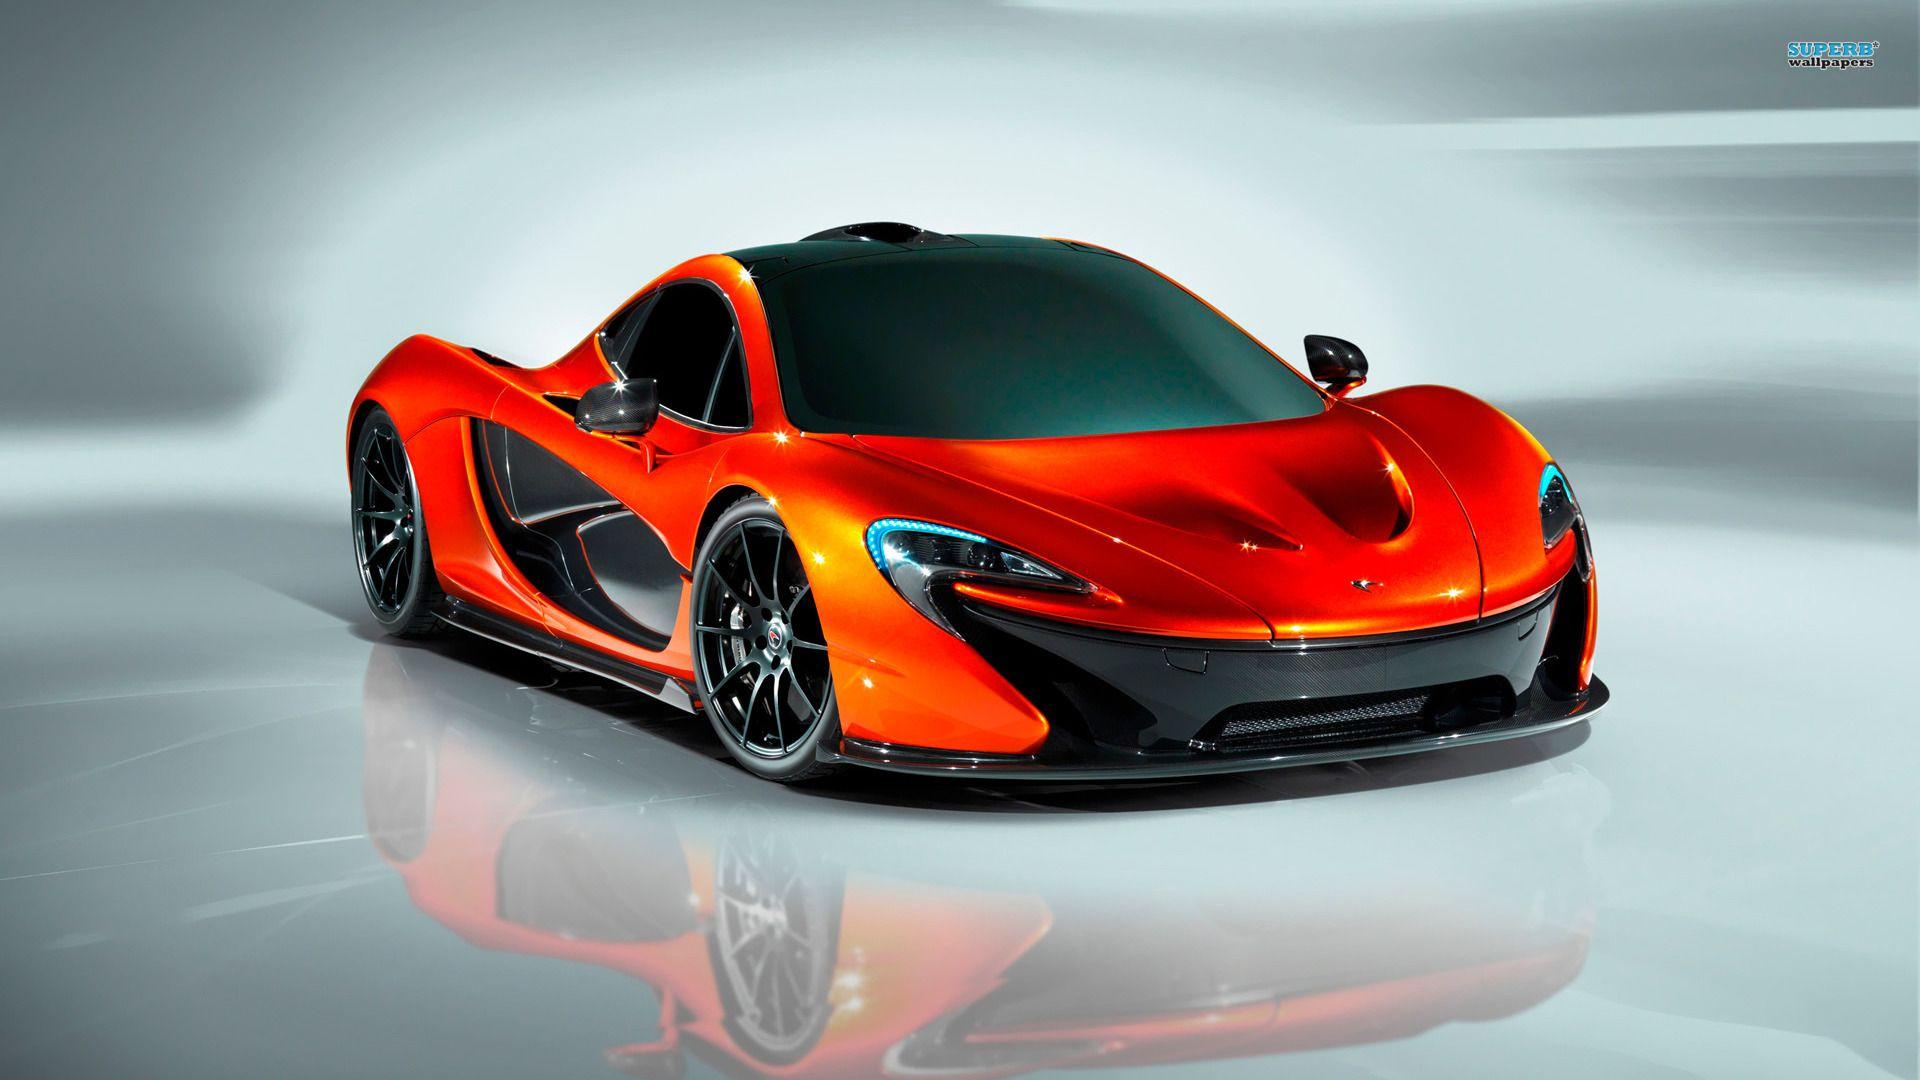 Mclaren P1   Google Search   Exotic Cars   Pinterest   Mclaren P1, Hot Cars  And Cars